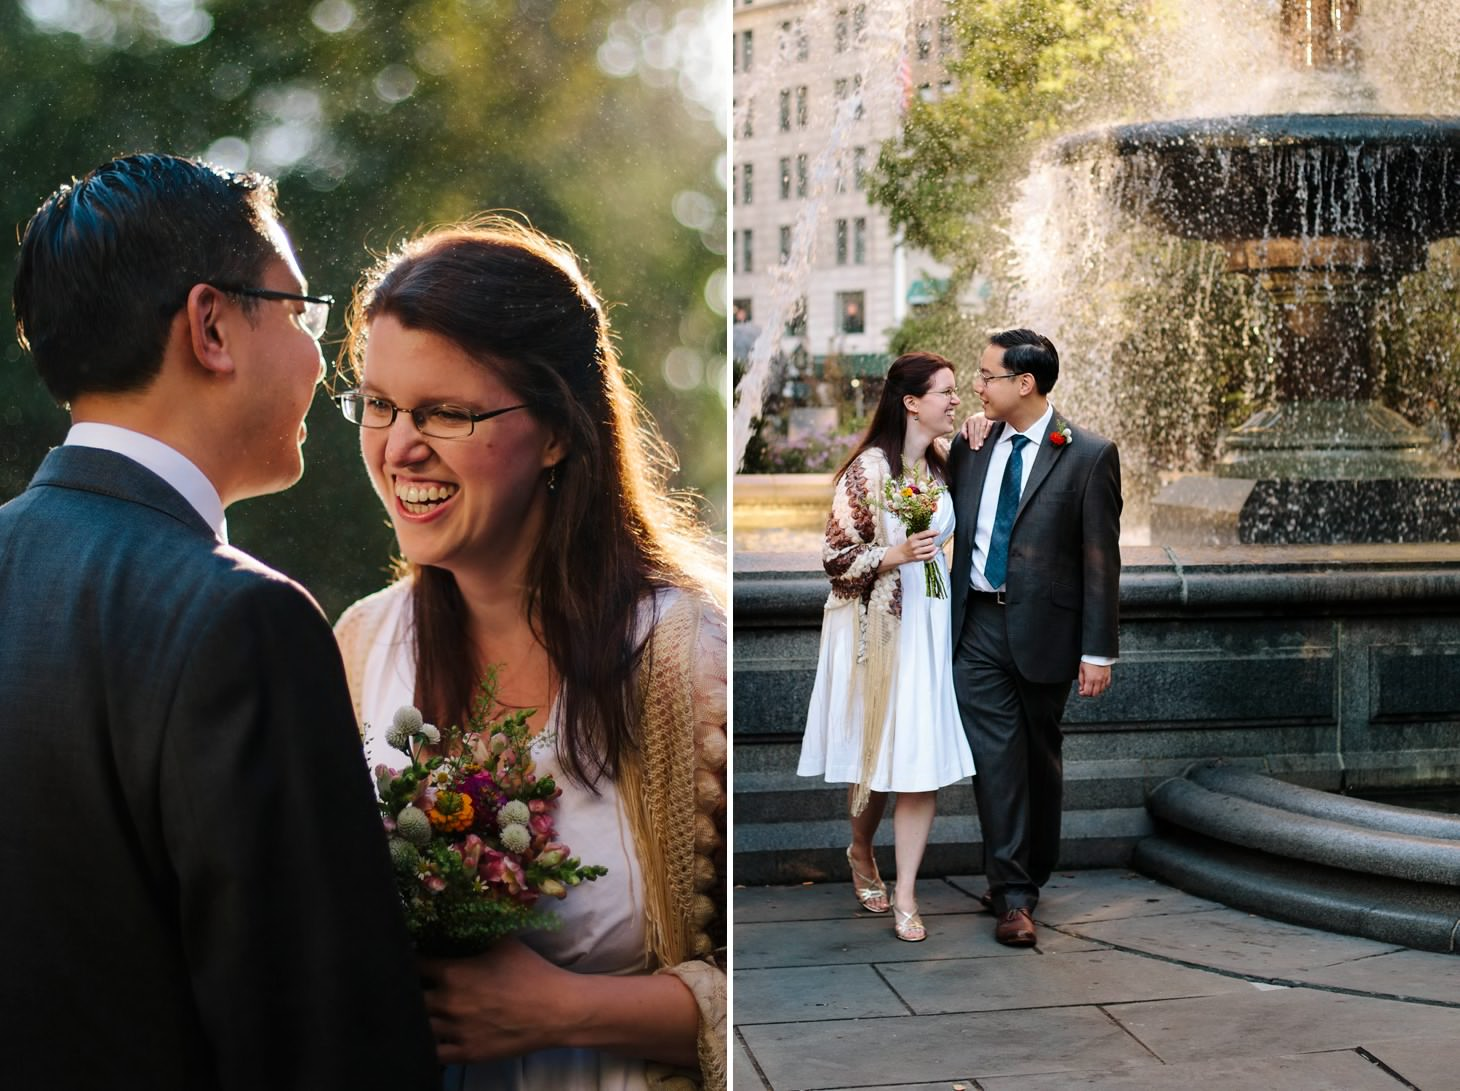 025-nyc-wedding-photographer-smitten-chickens-elope-nyc-city-hall-fall.jpg